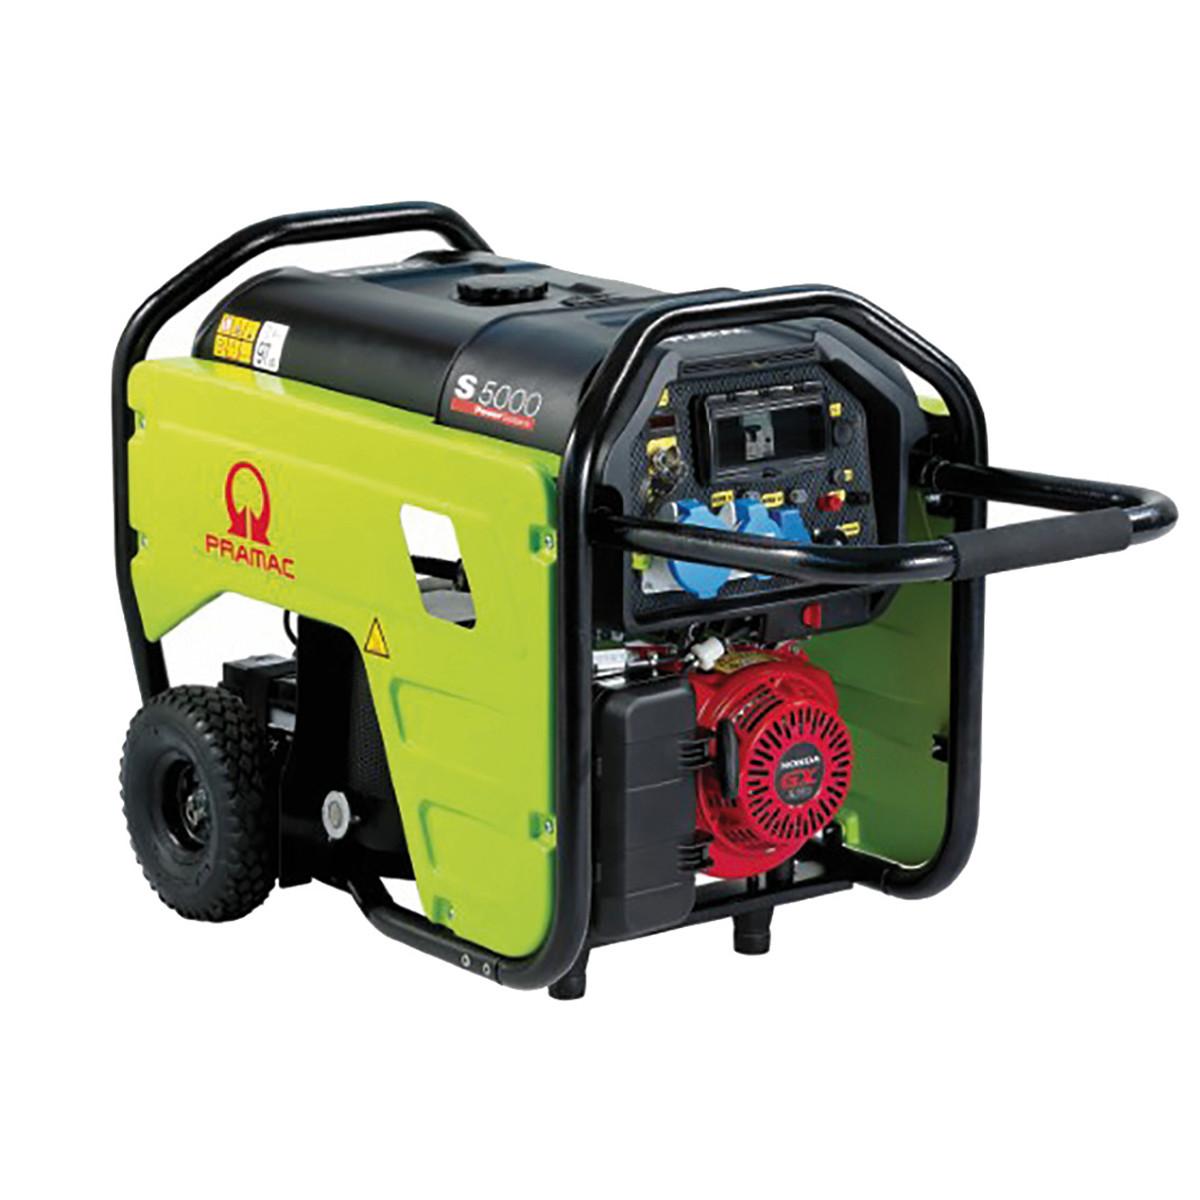 Generatore portatile wx3200 powermate by pramac prezzo e for Leroy merlin generatore